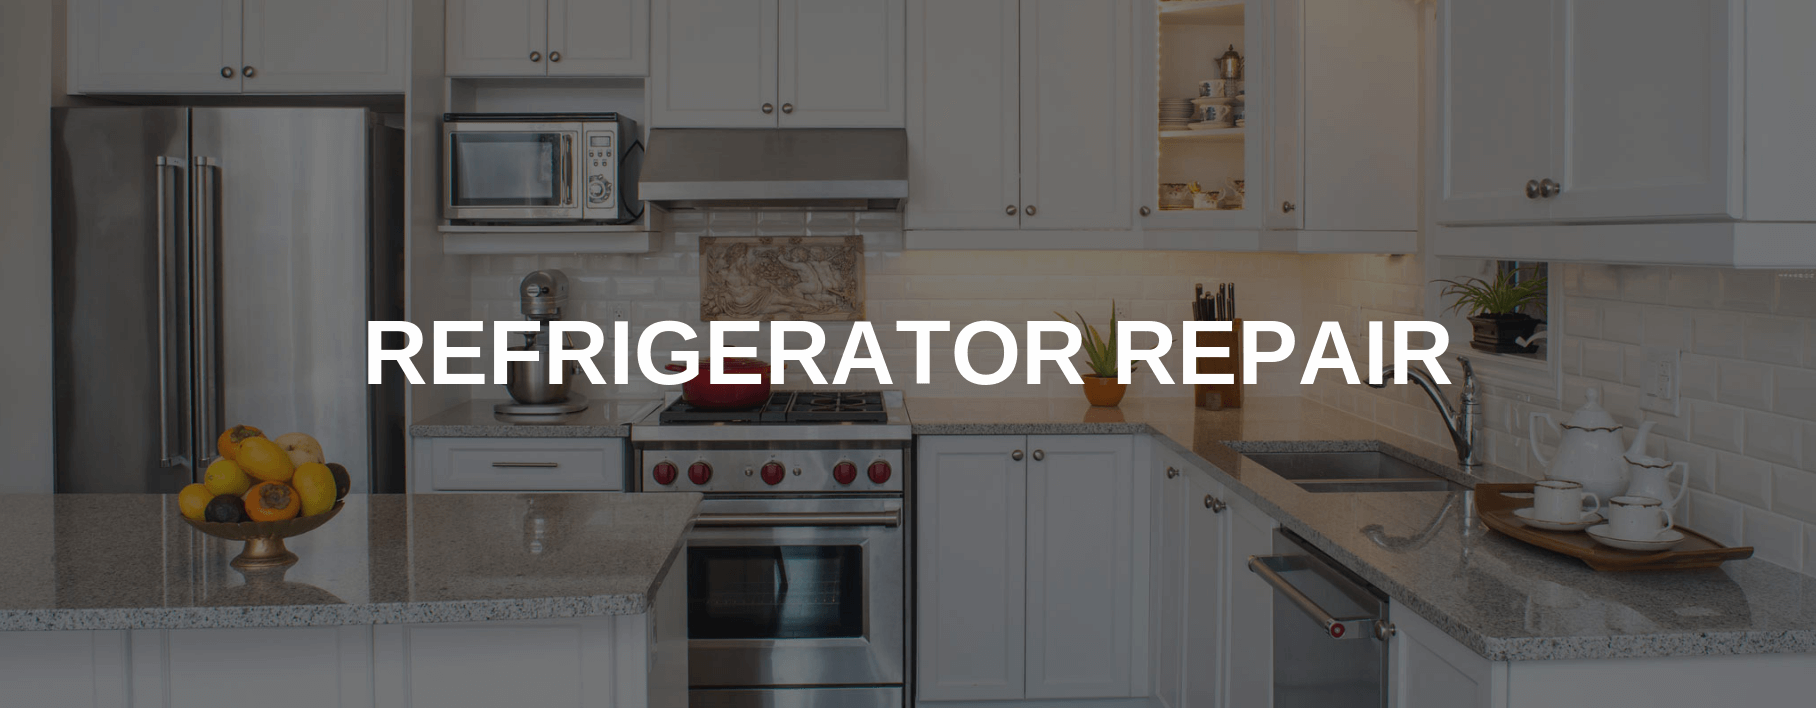 refrigerator repair waterbury